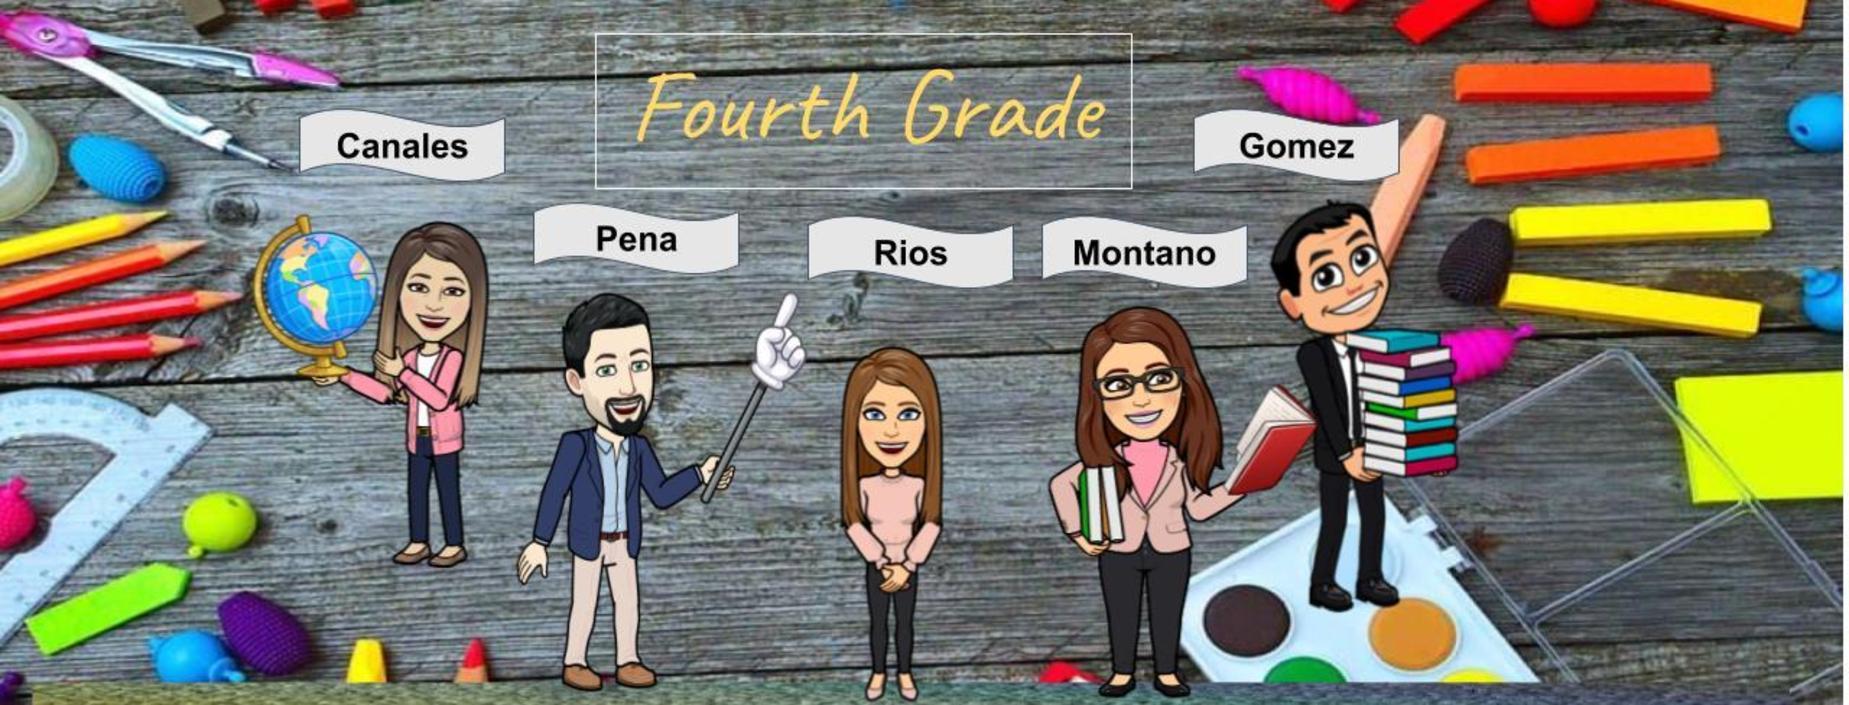 4th grade staff emoji